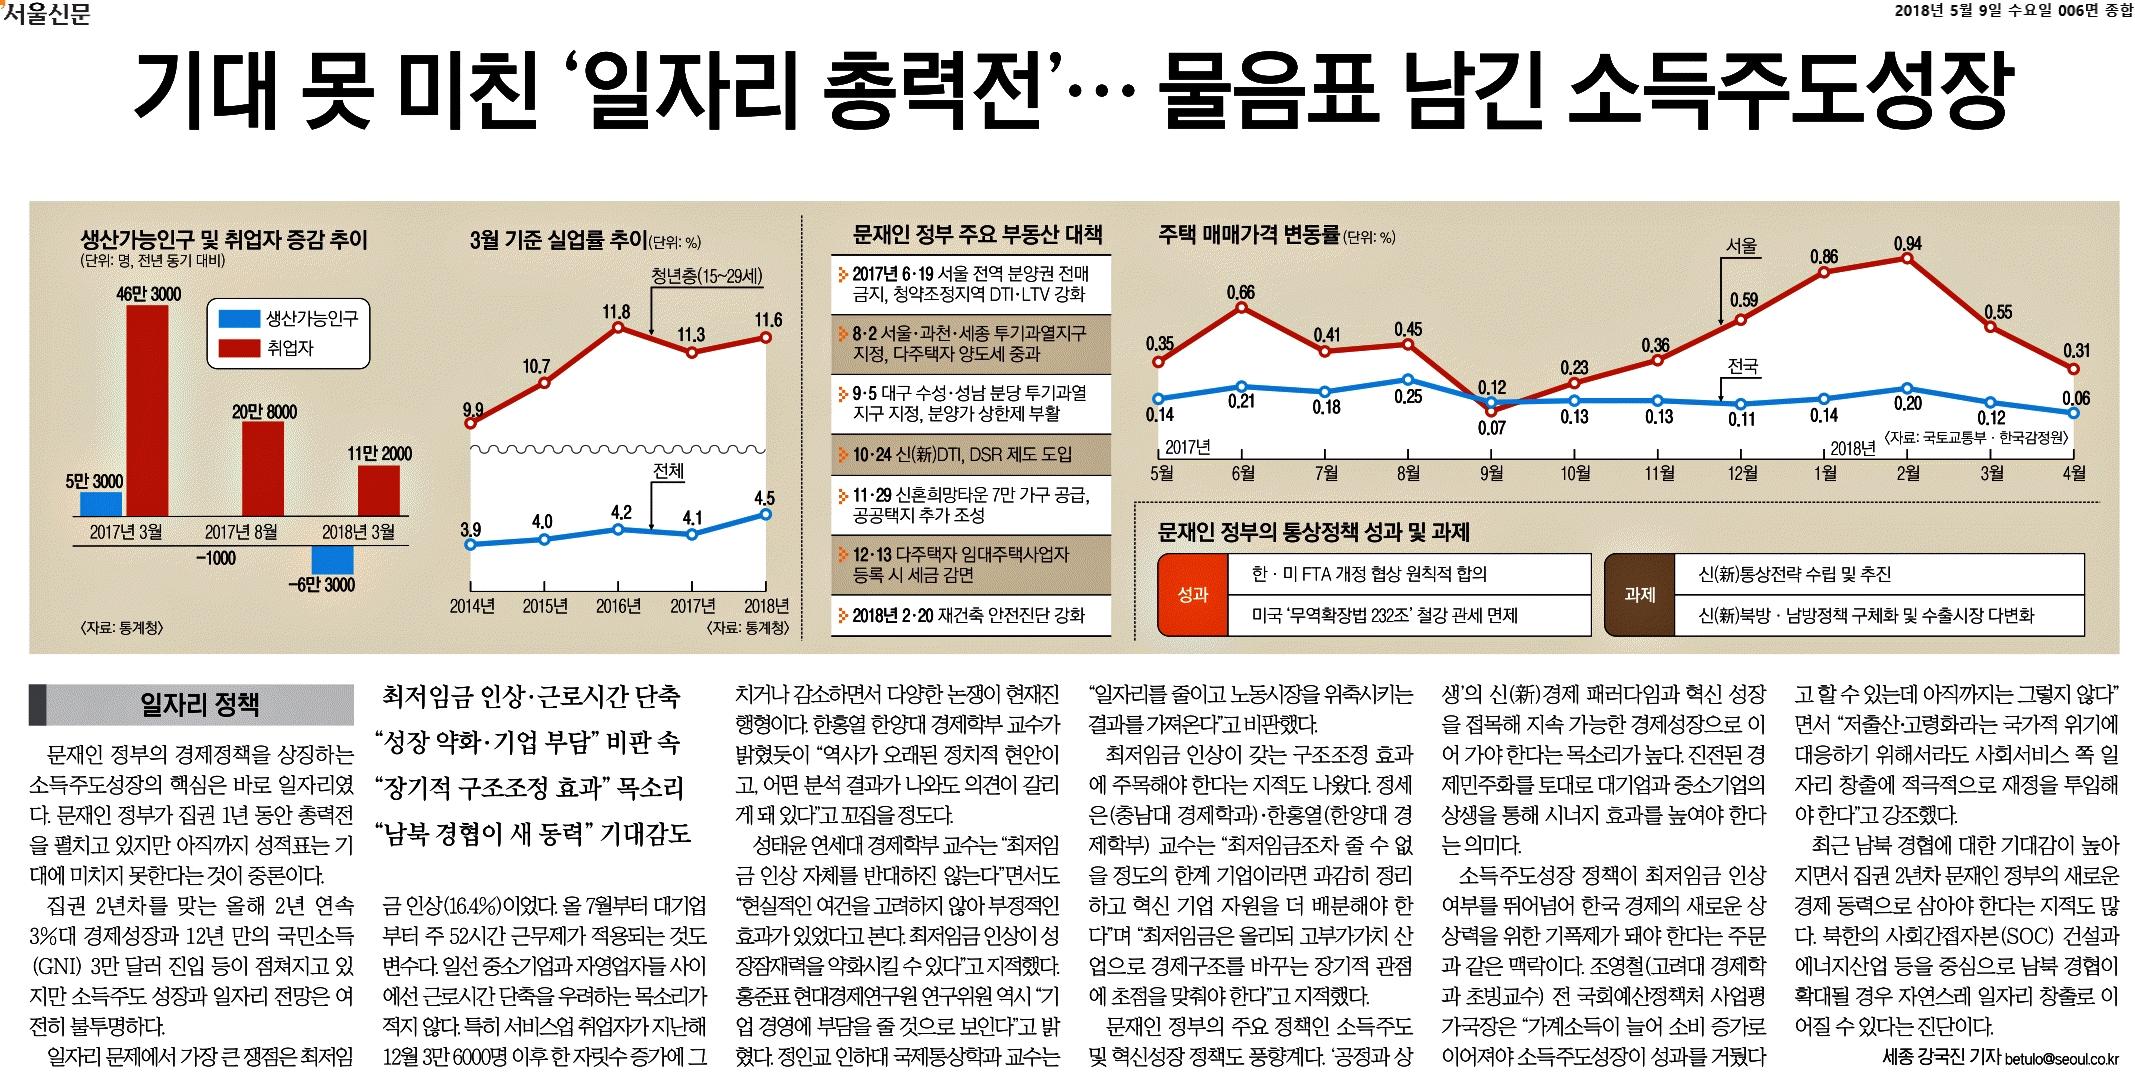 "KDI 원장 ""고도성장 향수 벗어나야"""